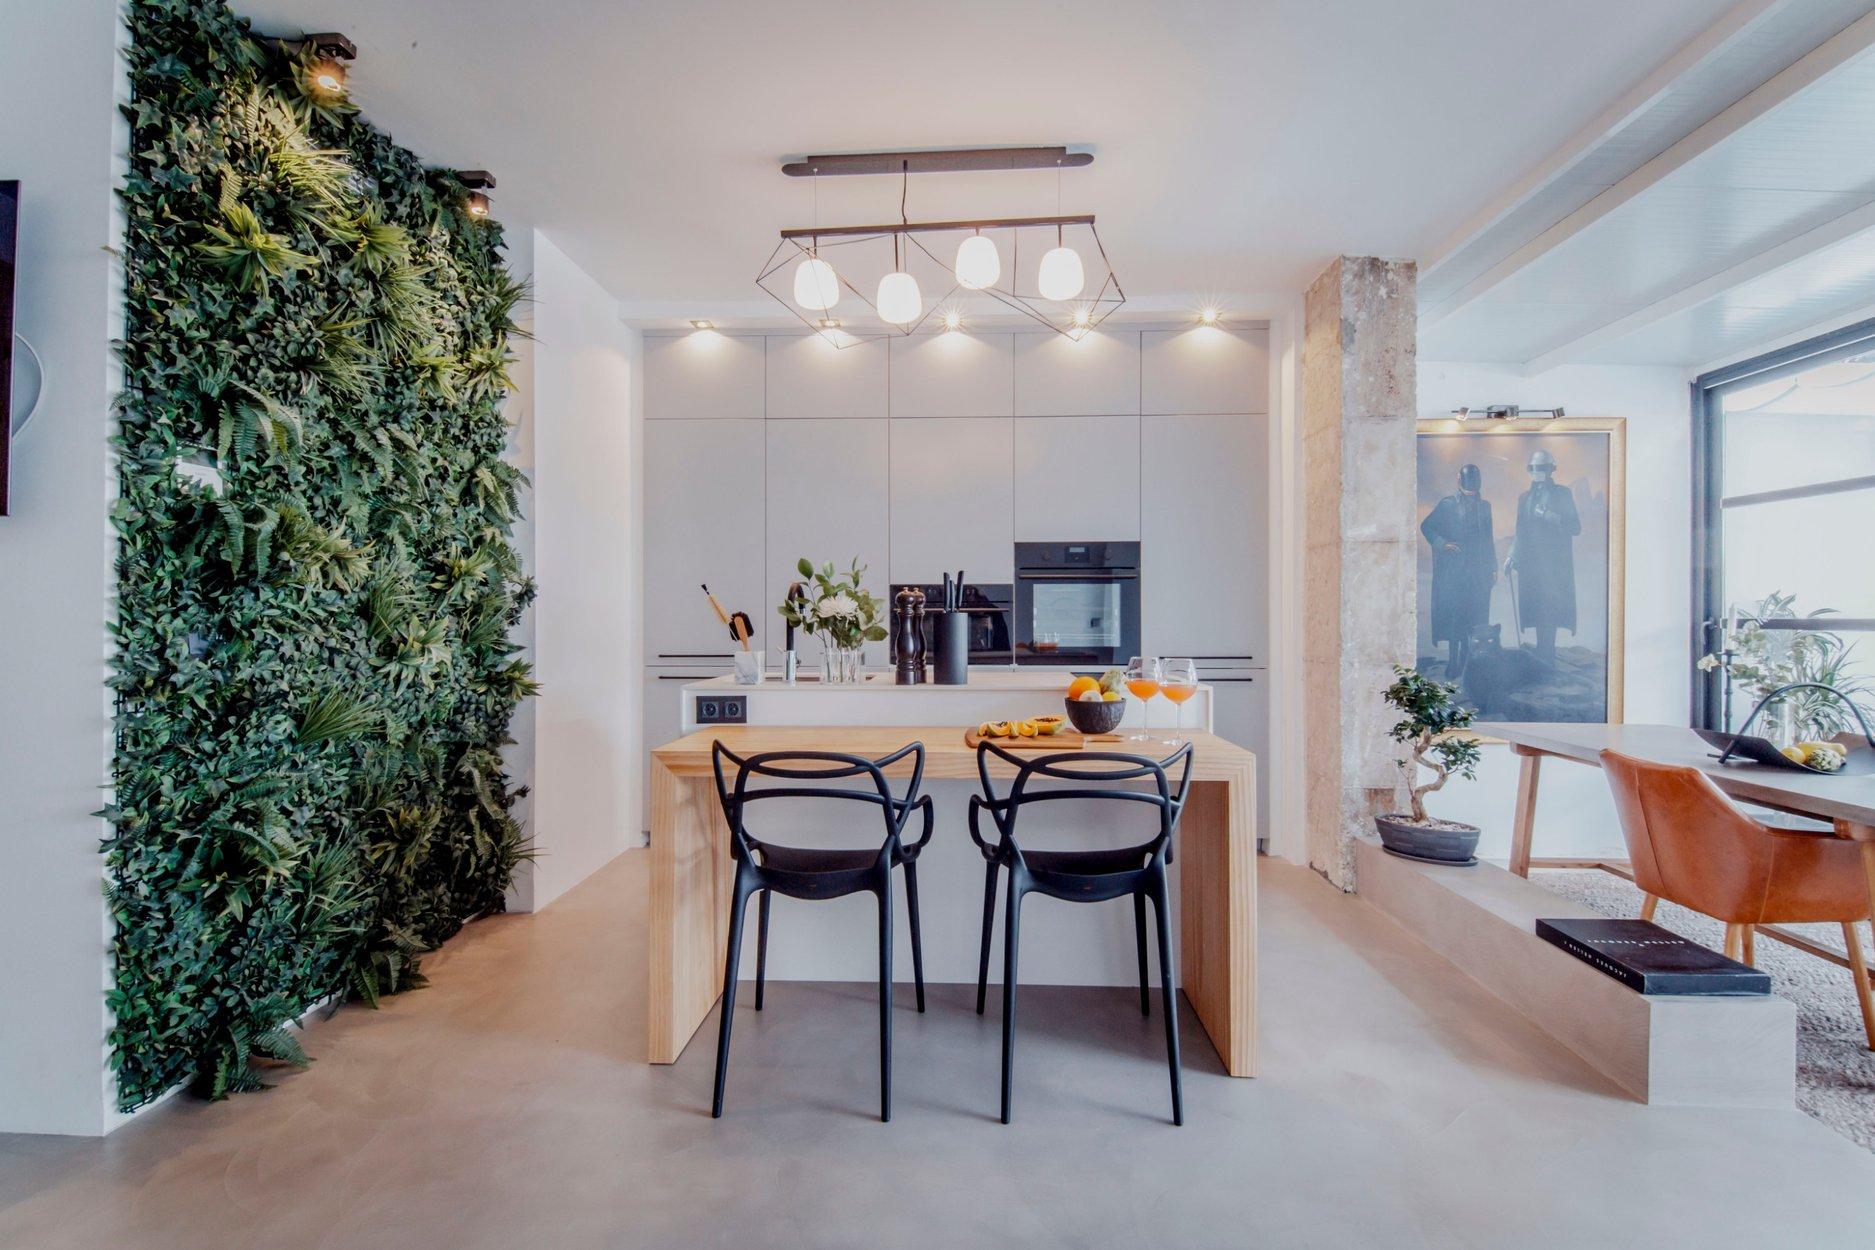 1 Bedroom 2 Bathroom Apartment For Sale In Marbella Golden